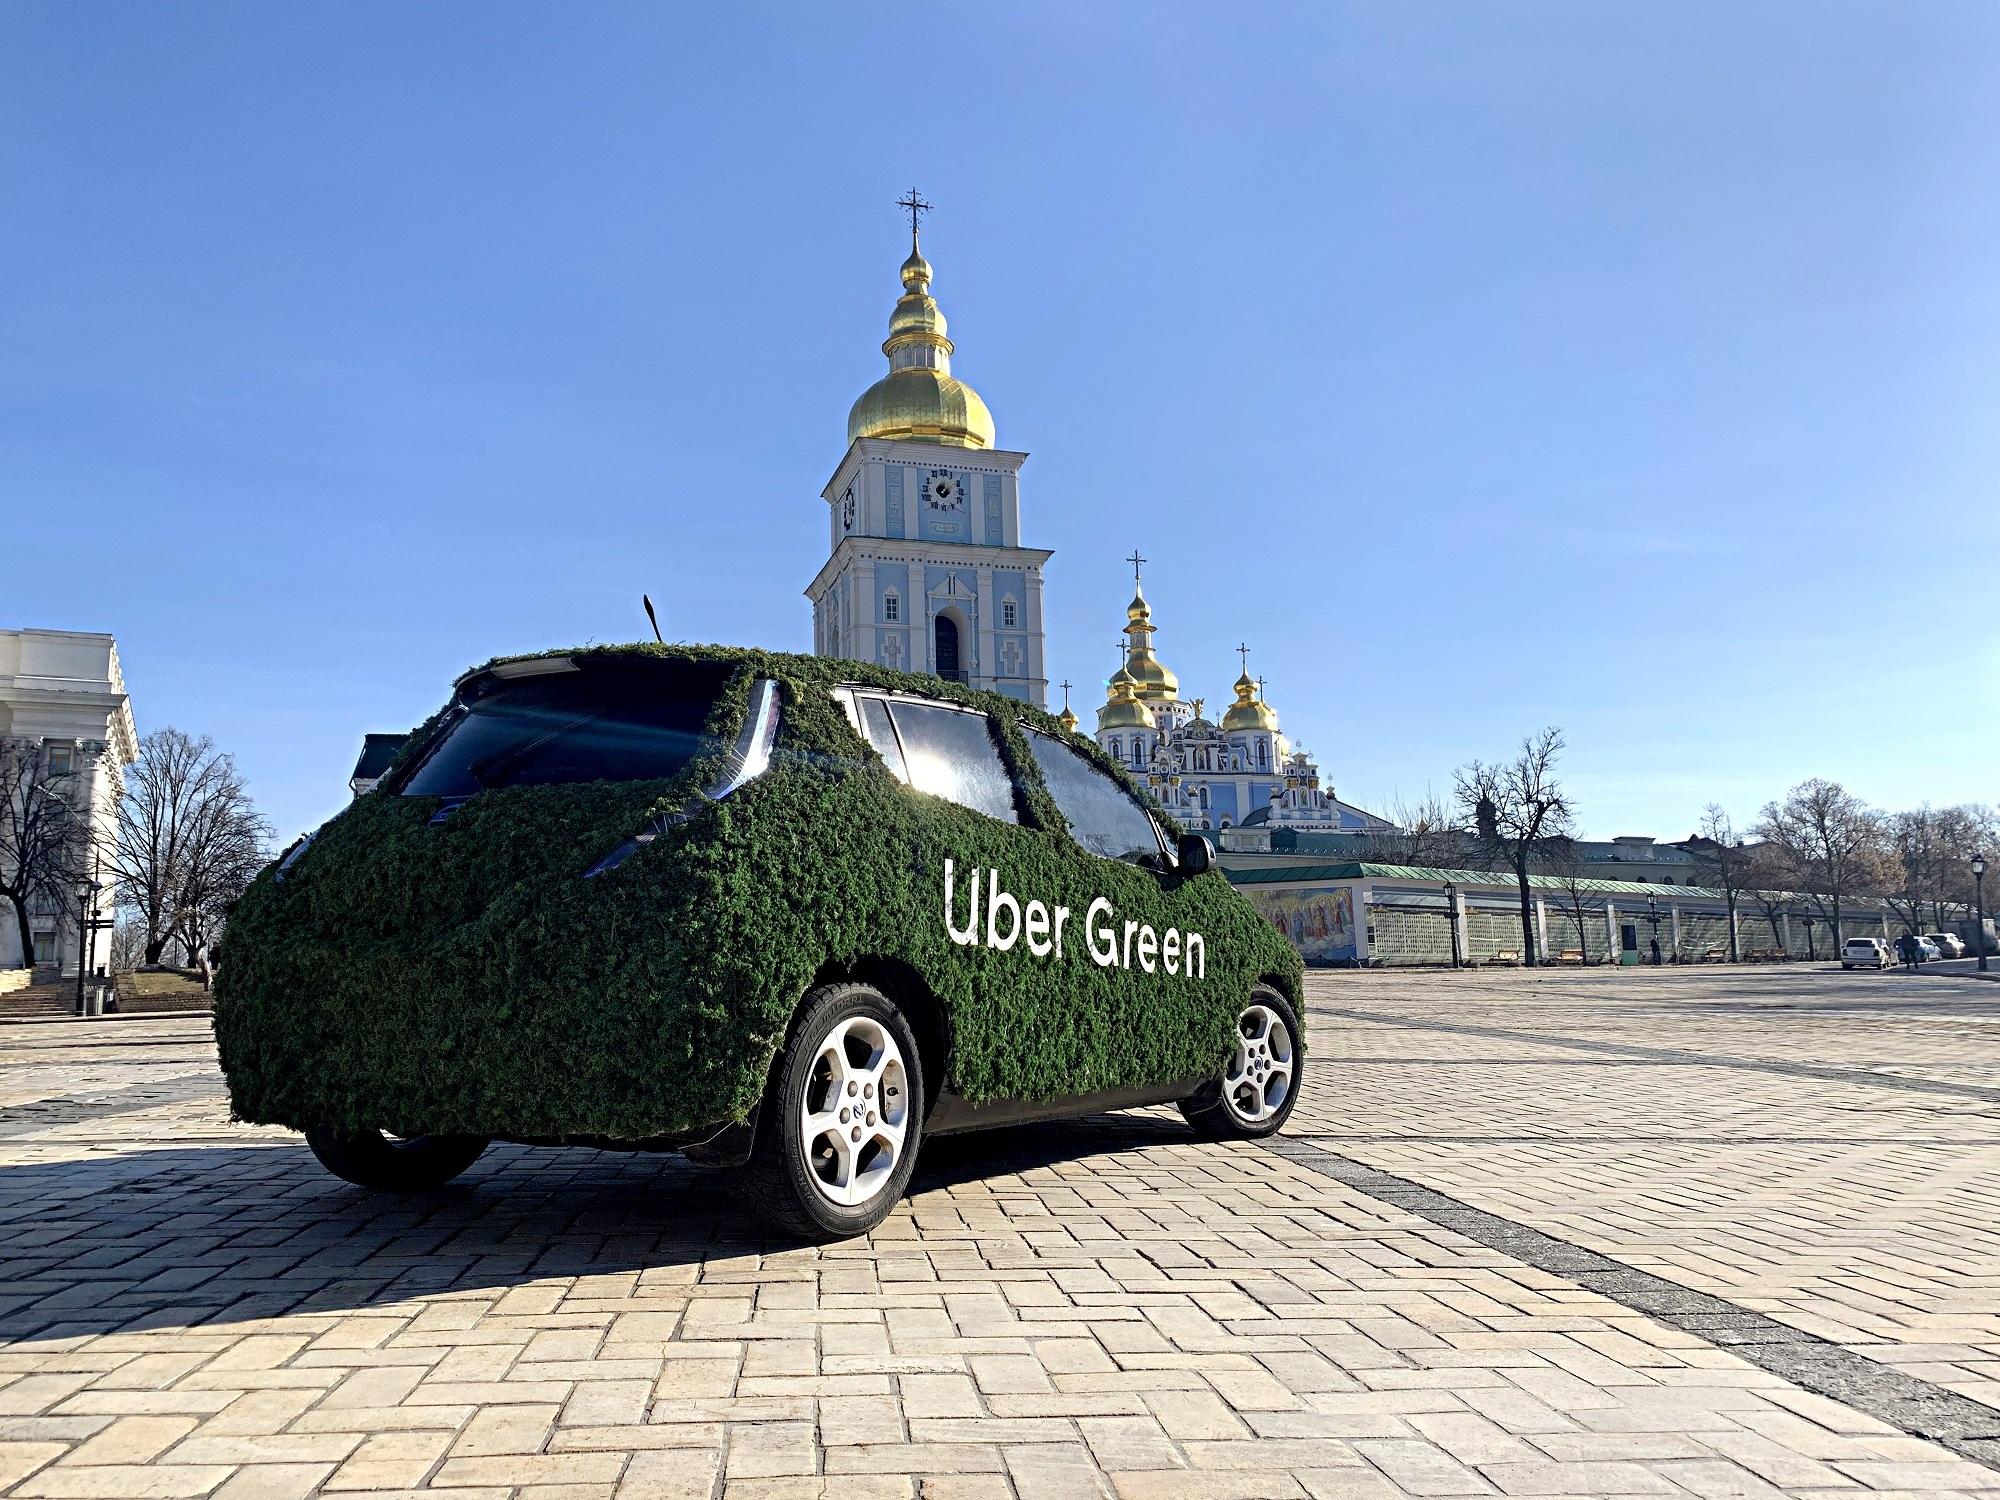 Uber запустил в Киеве сервис Uber Green на основе электромобилей Nissan Leaf,  Renault Zoe и др. по цене UberSELECT